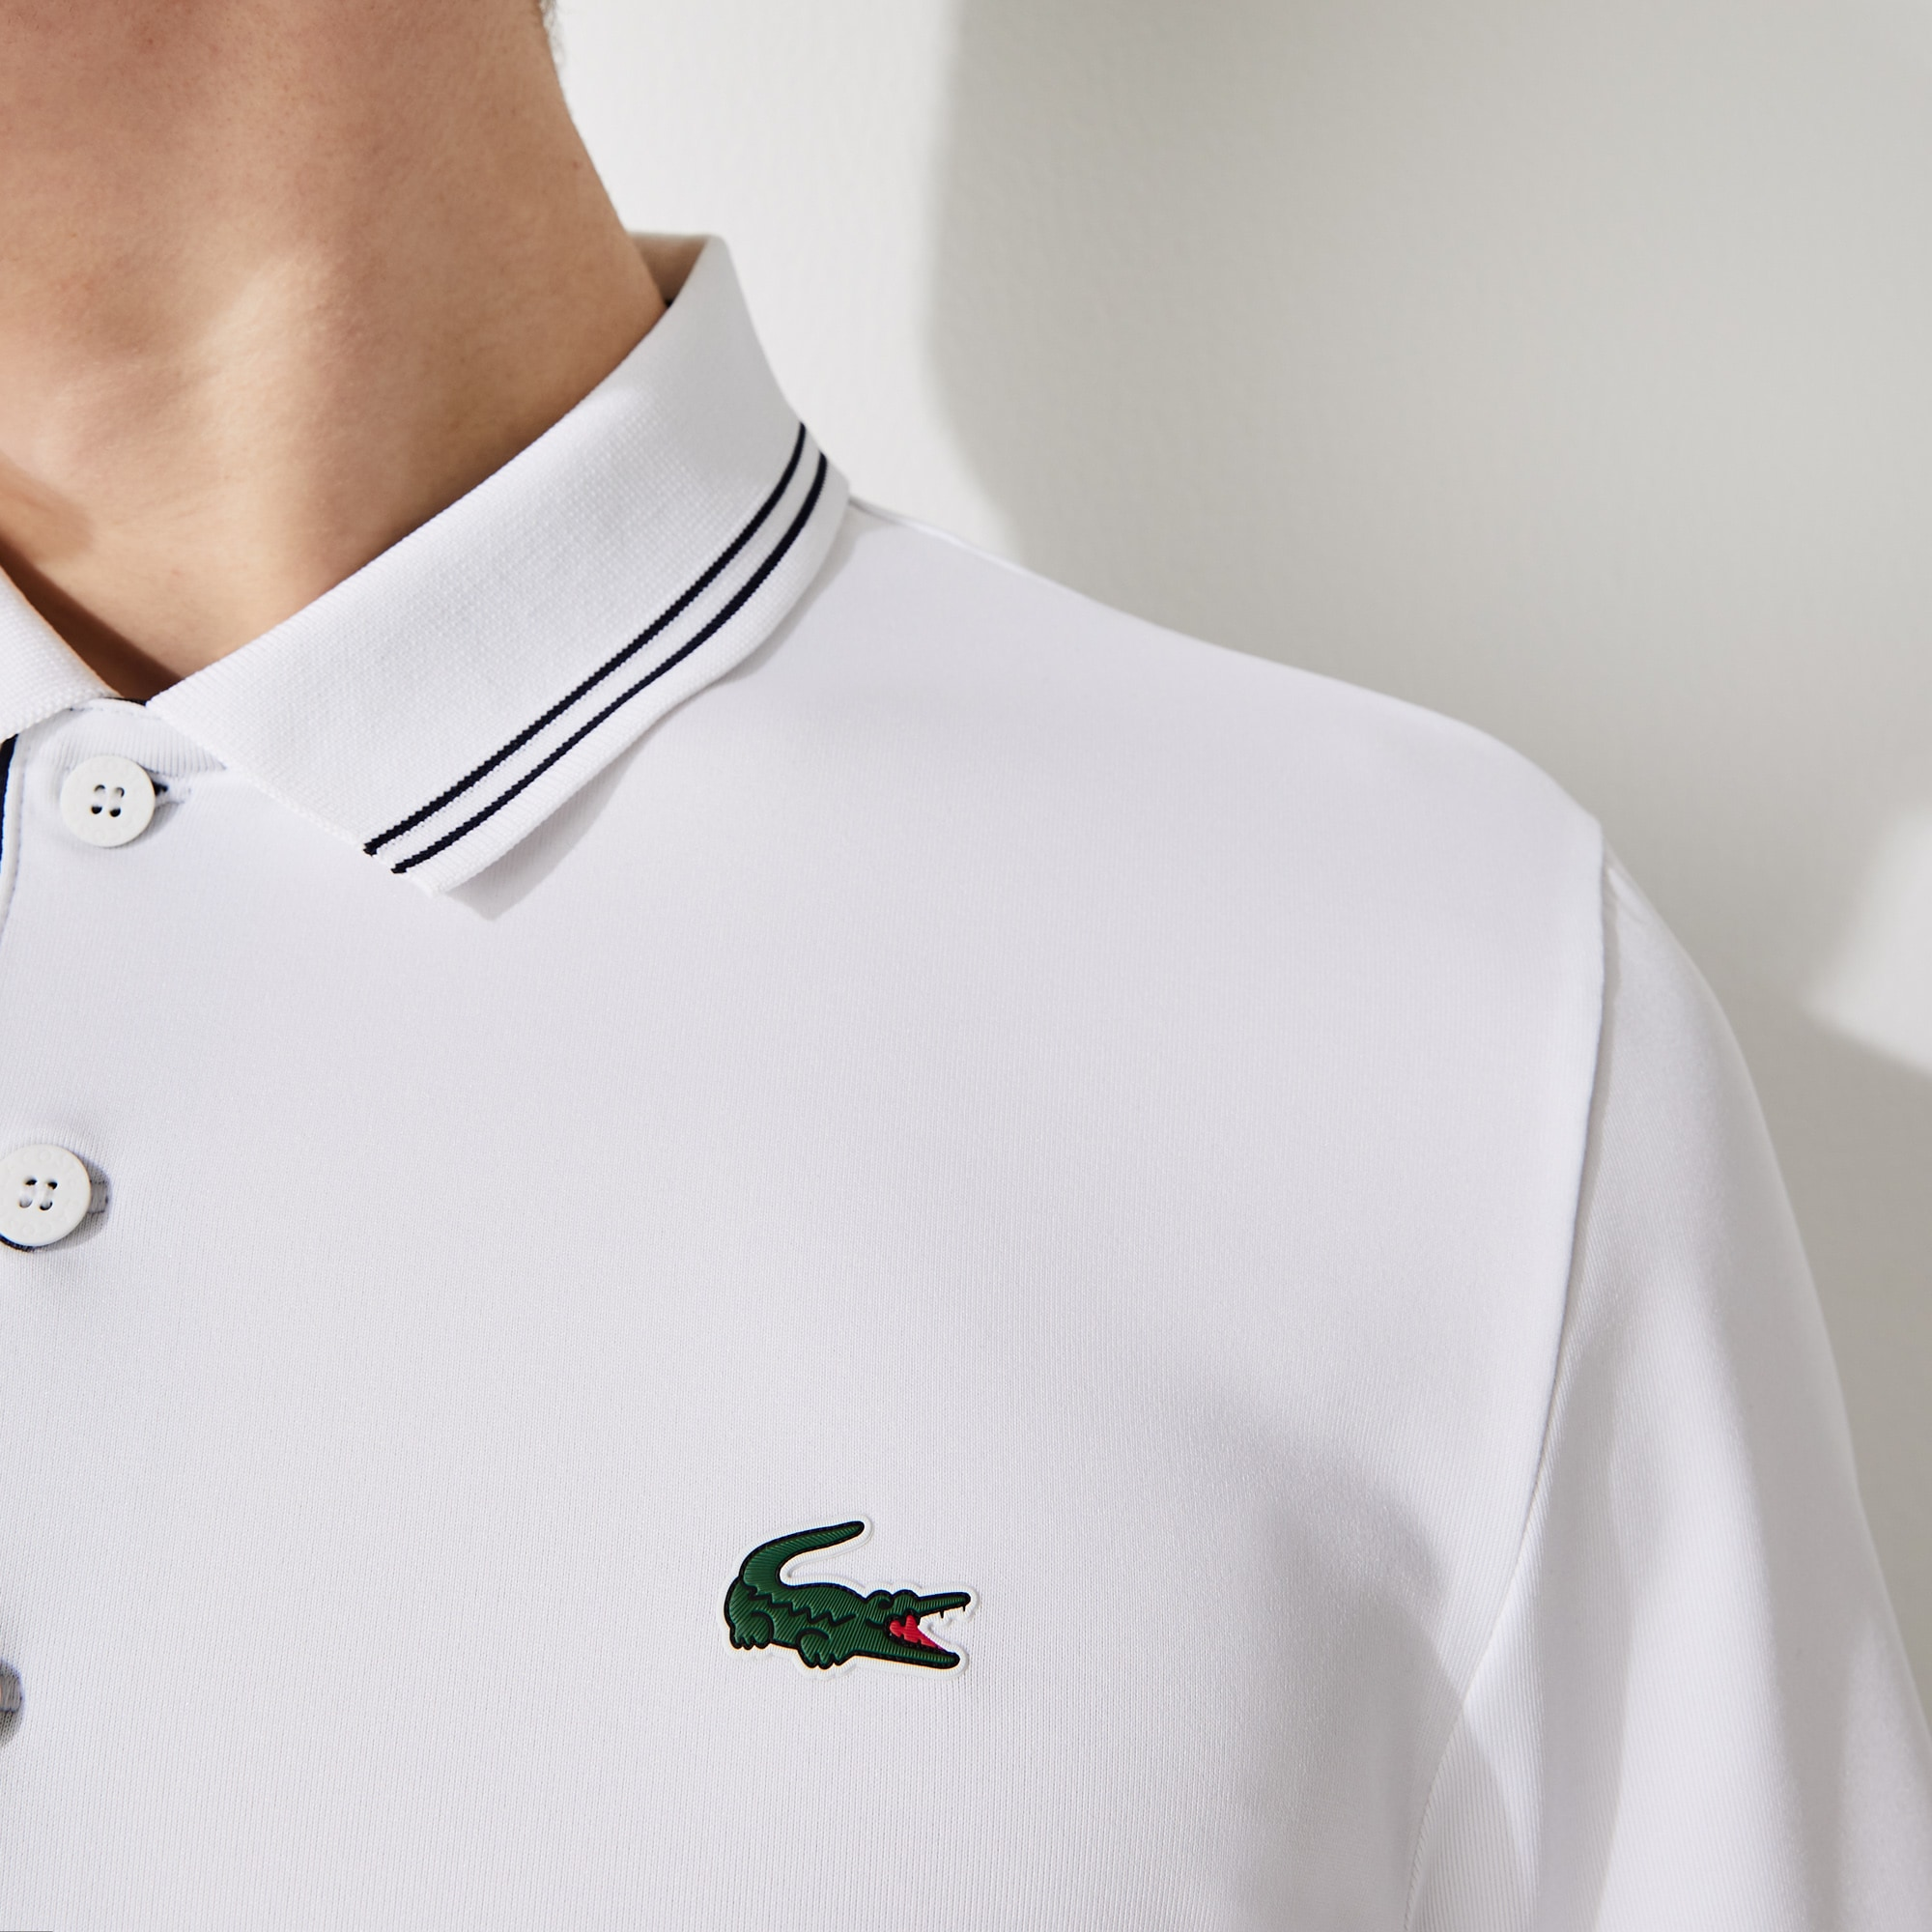 Men's Lacoste SPORT Signature Breathable Golf Polo Shirt